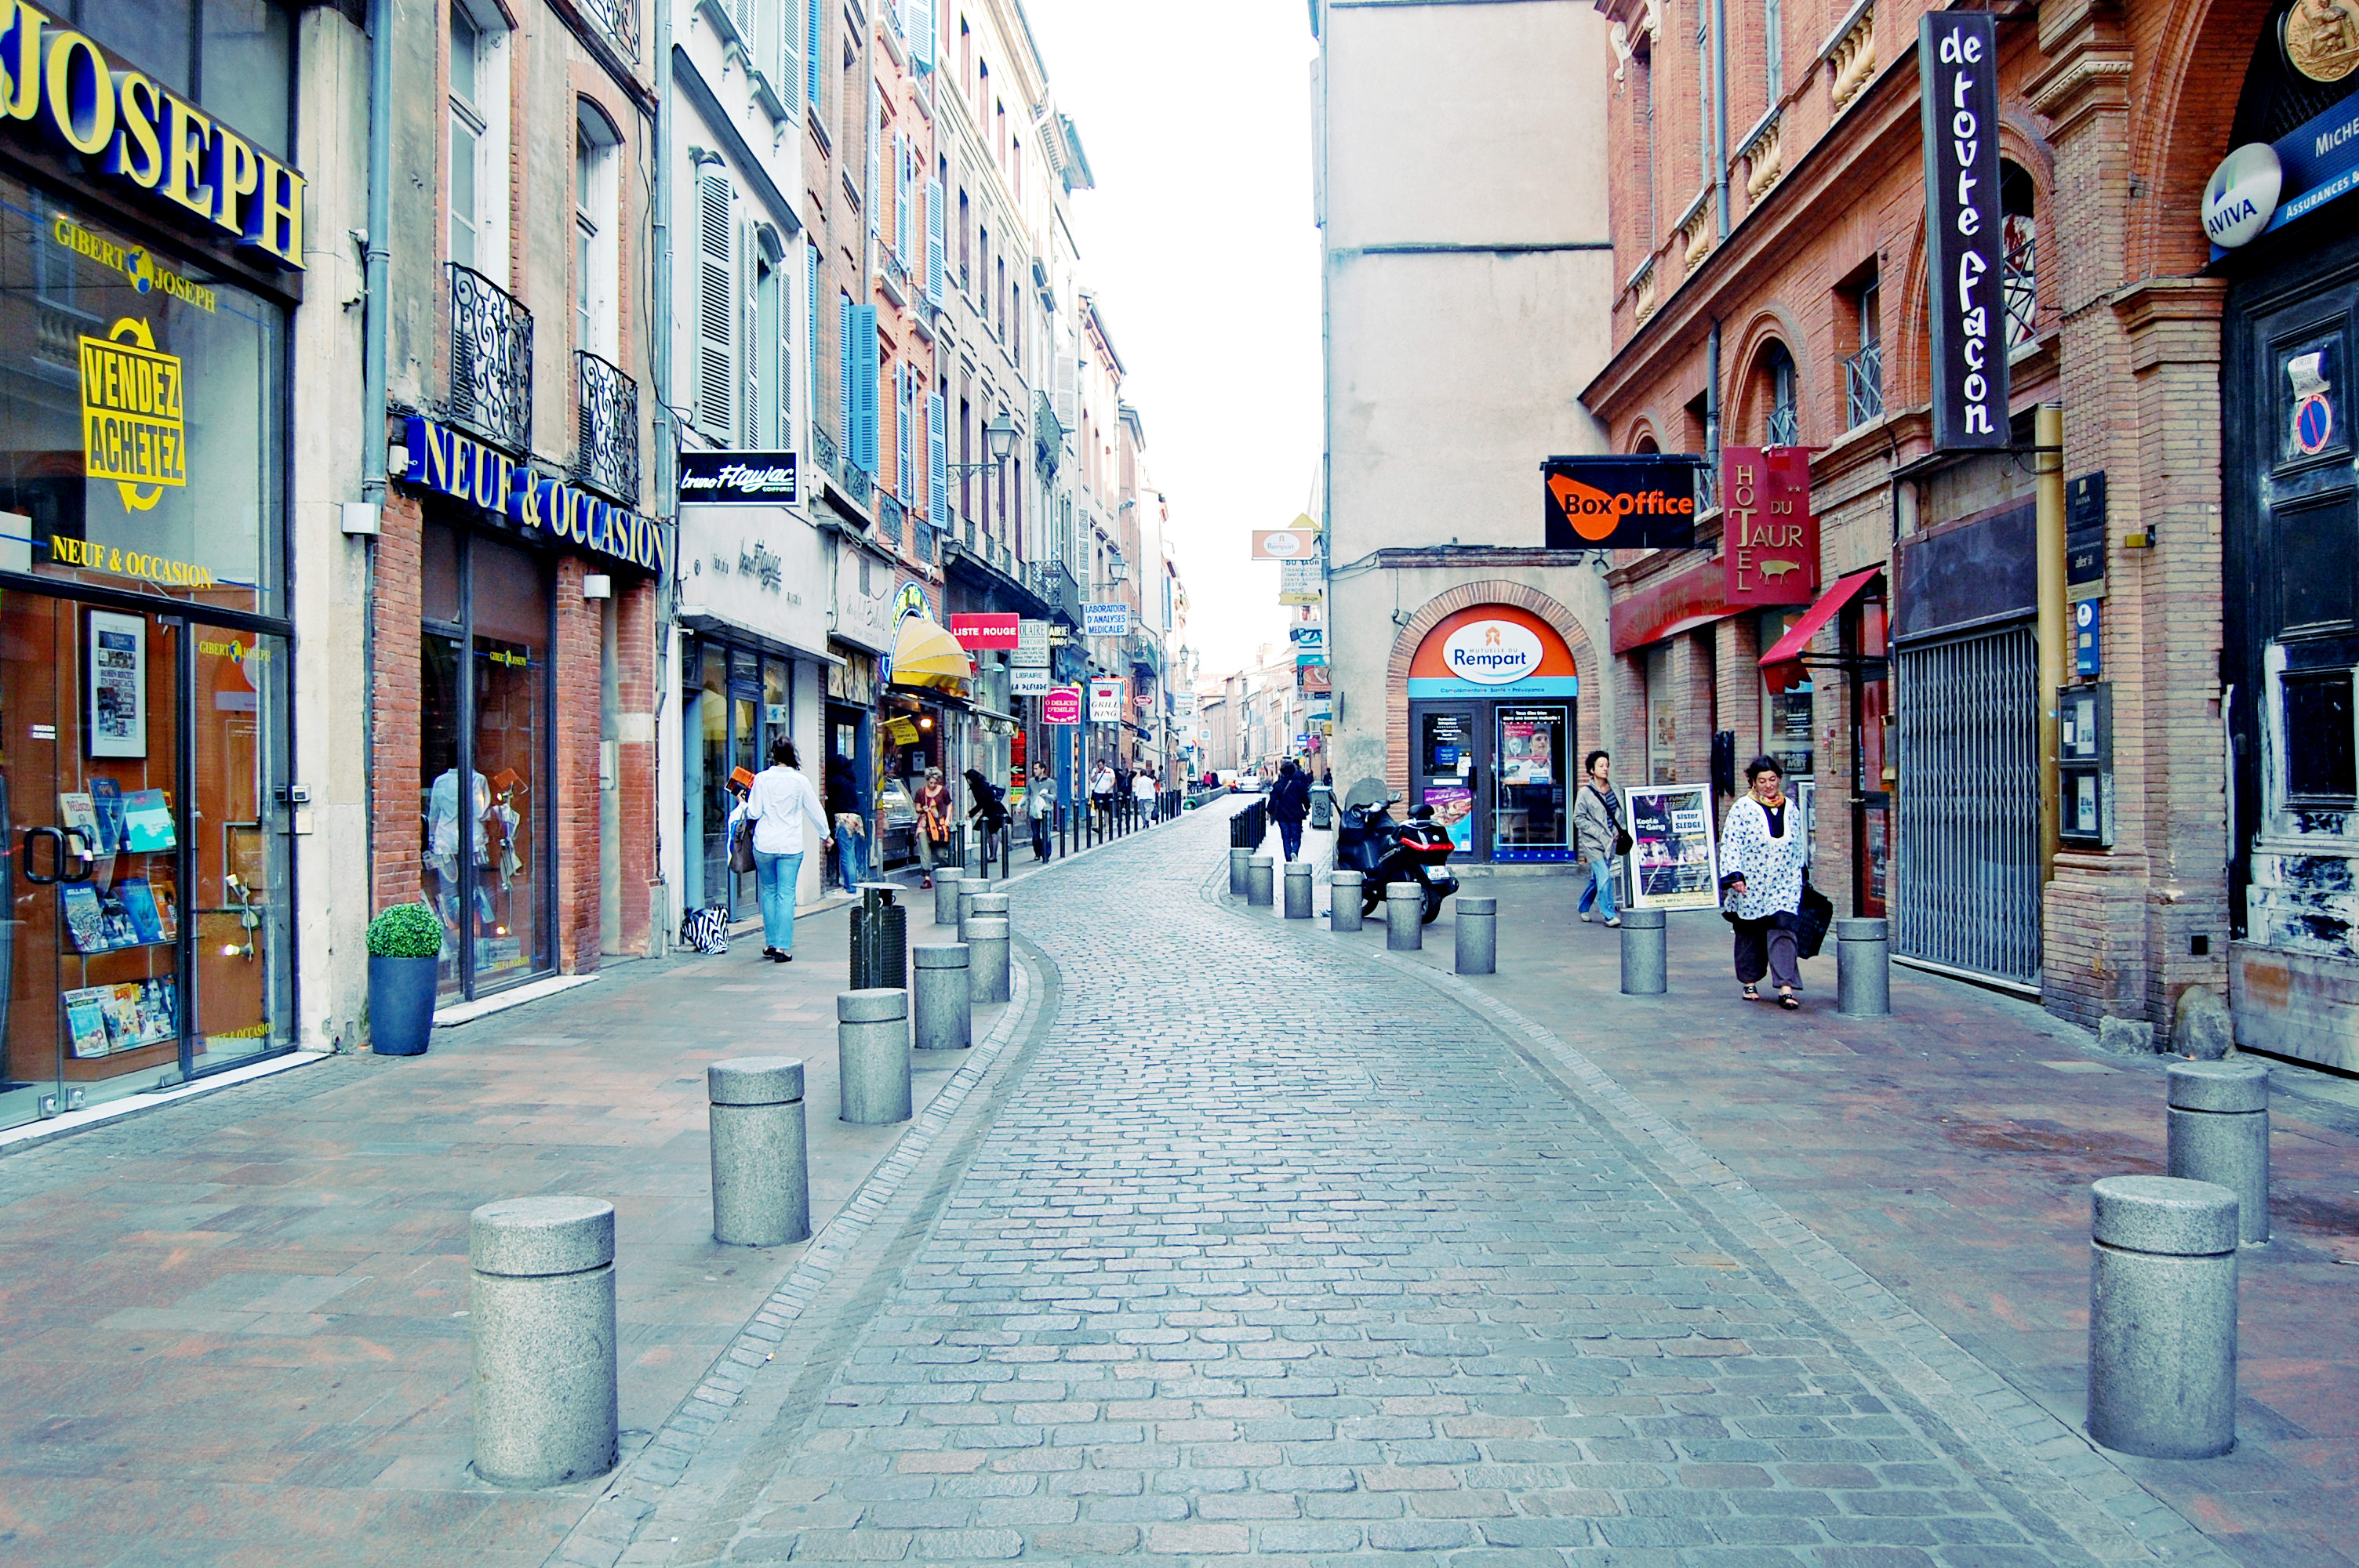 French city photo